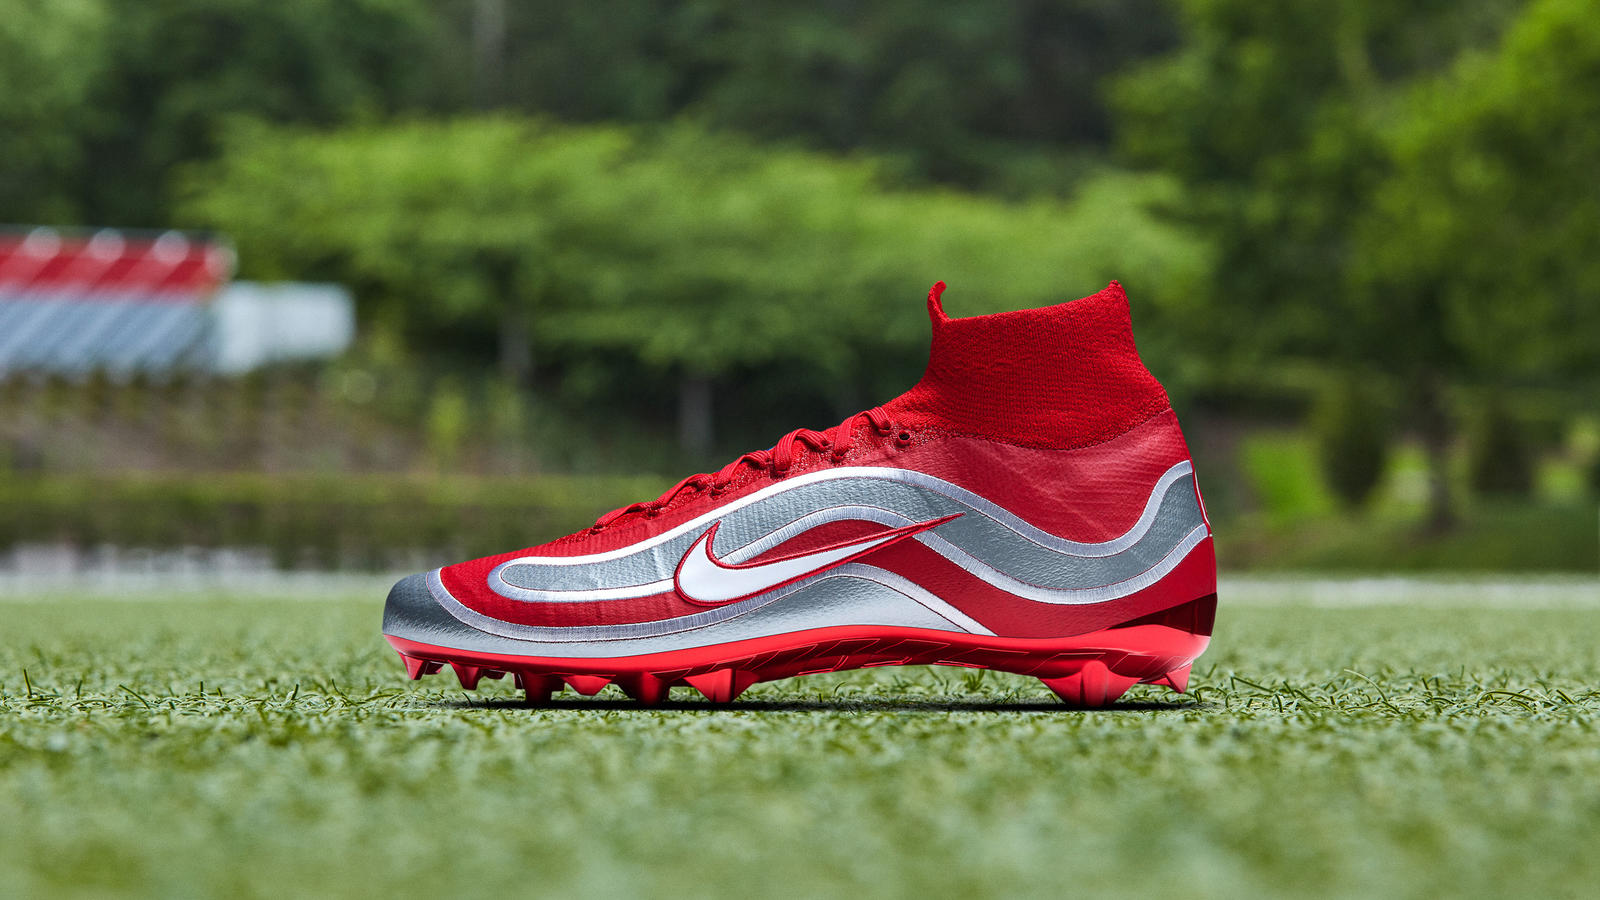 Nike Mercurial Cleat (Odell Beckham Jr